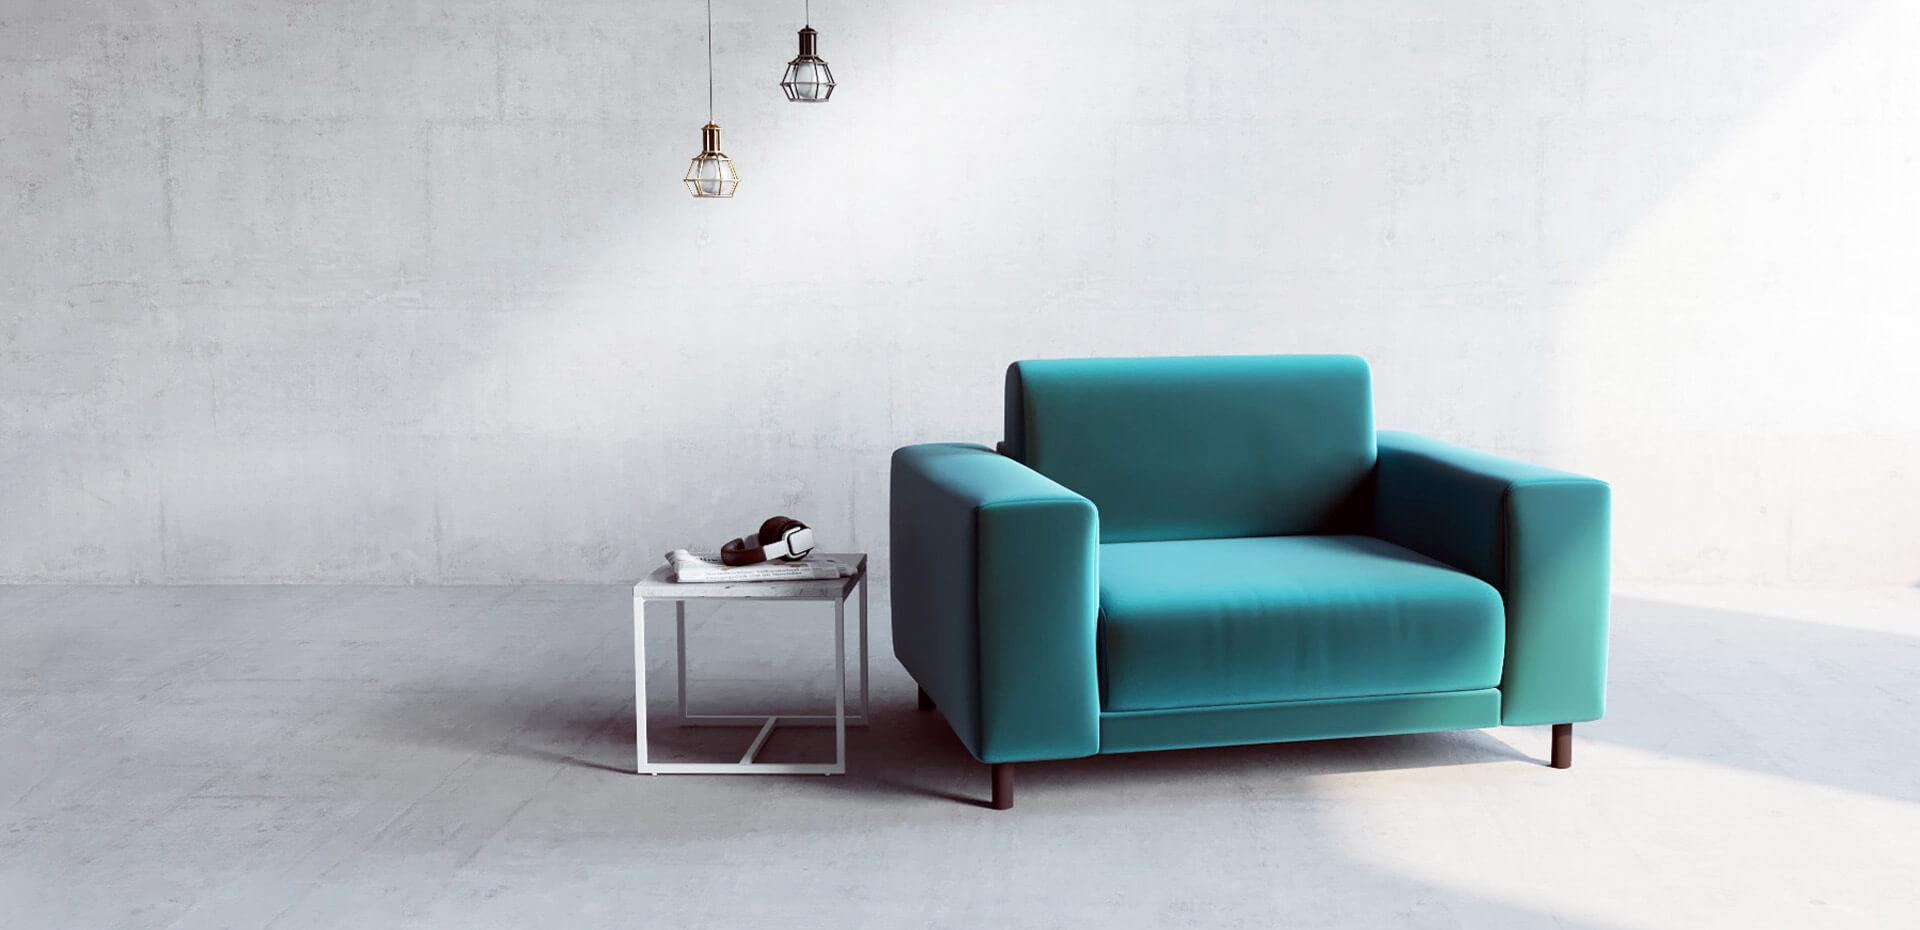 Sessel In Blau Online Designen Sessel Bei Mycs Mycs Deutschland